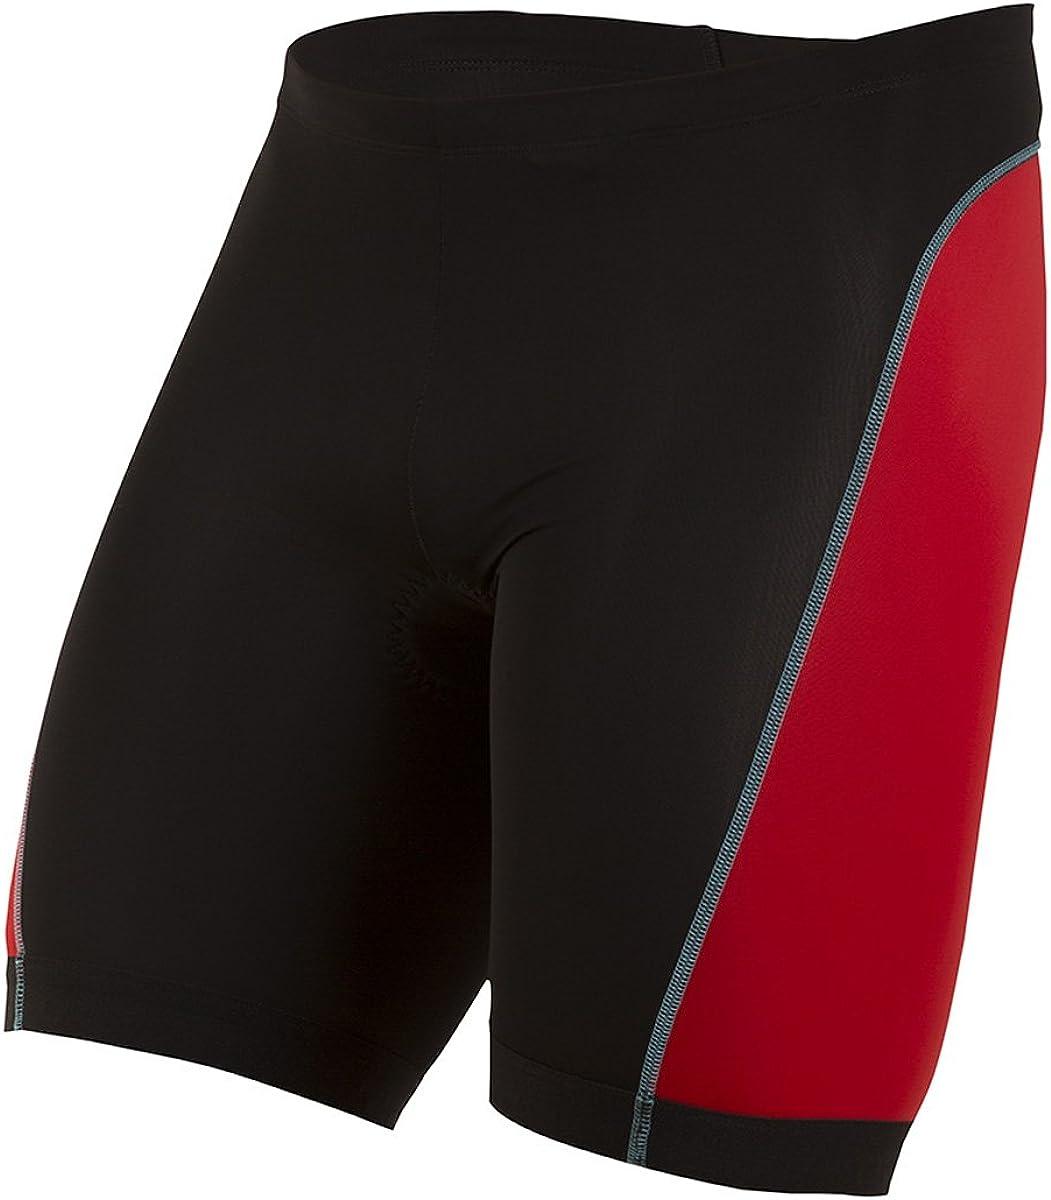 Long-awaited PEARL IZUMI Men's Select Pursuit Tri Shorts Max 70% OFF True X-S Black Red